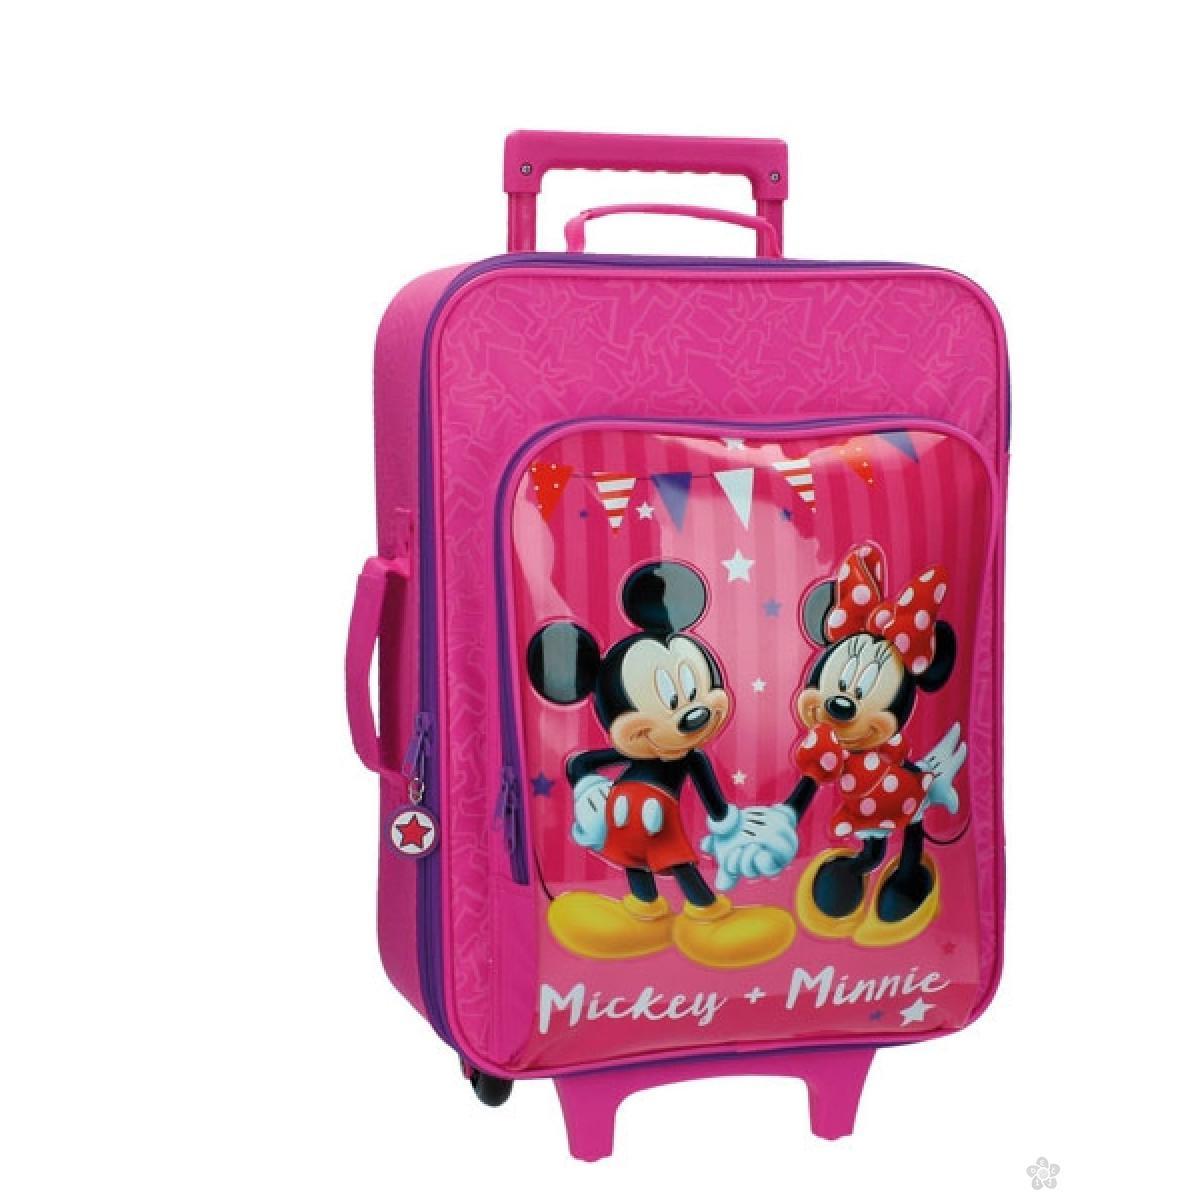 Kofer Minnie Mouse 50cm 26.990.51